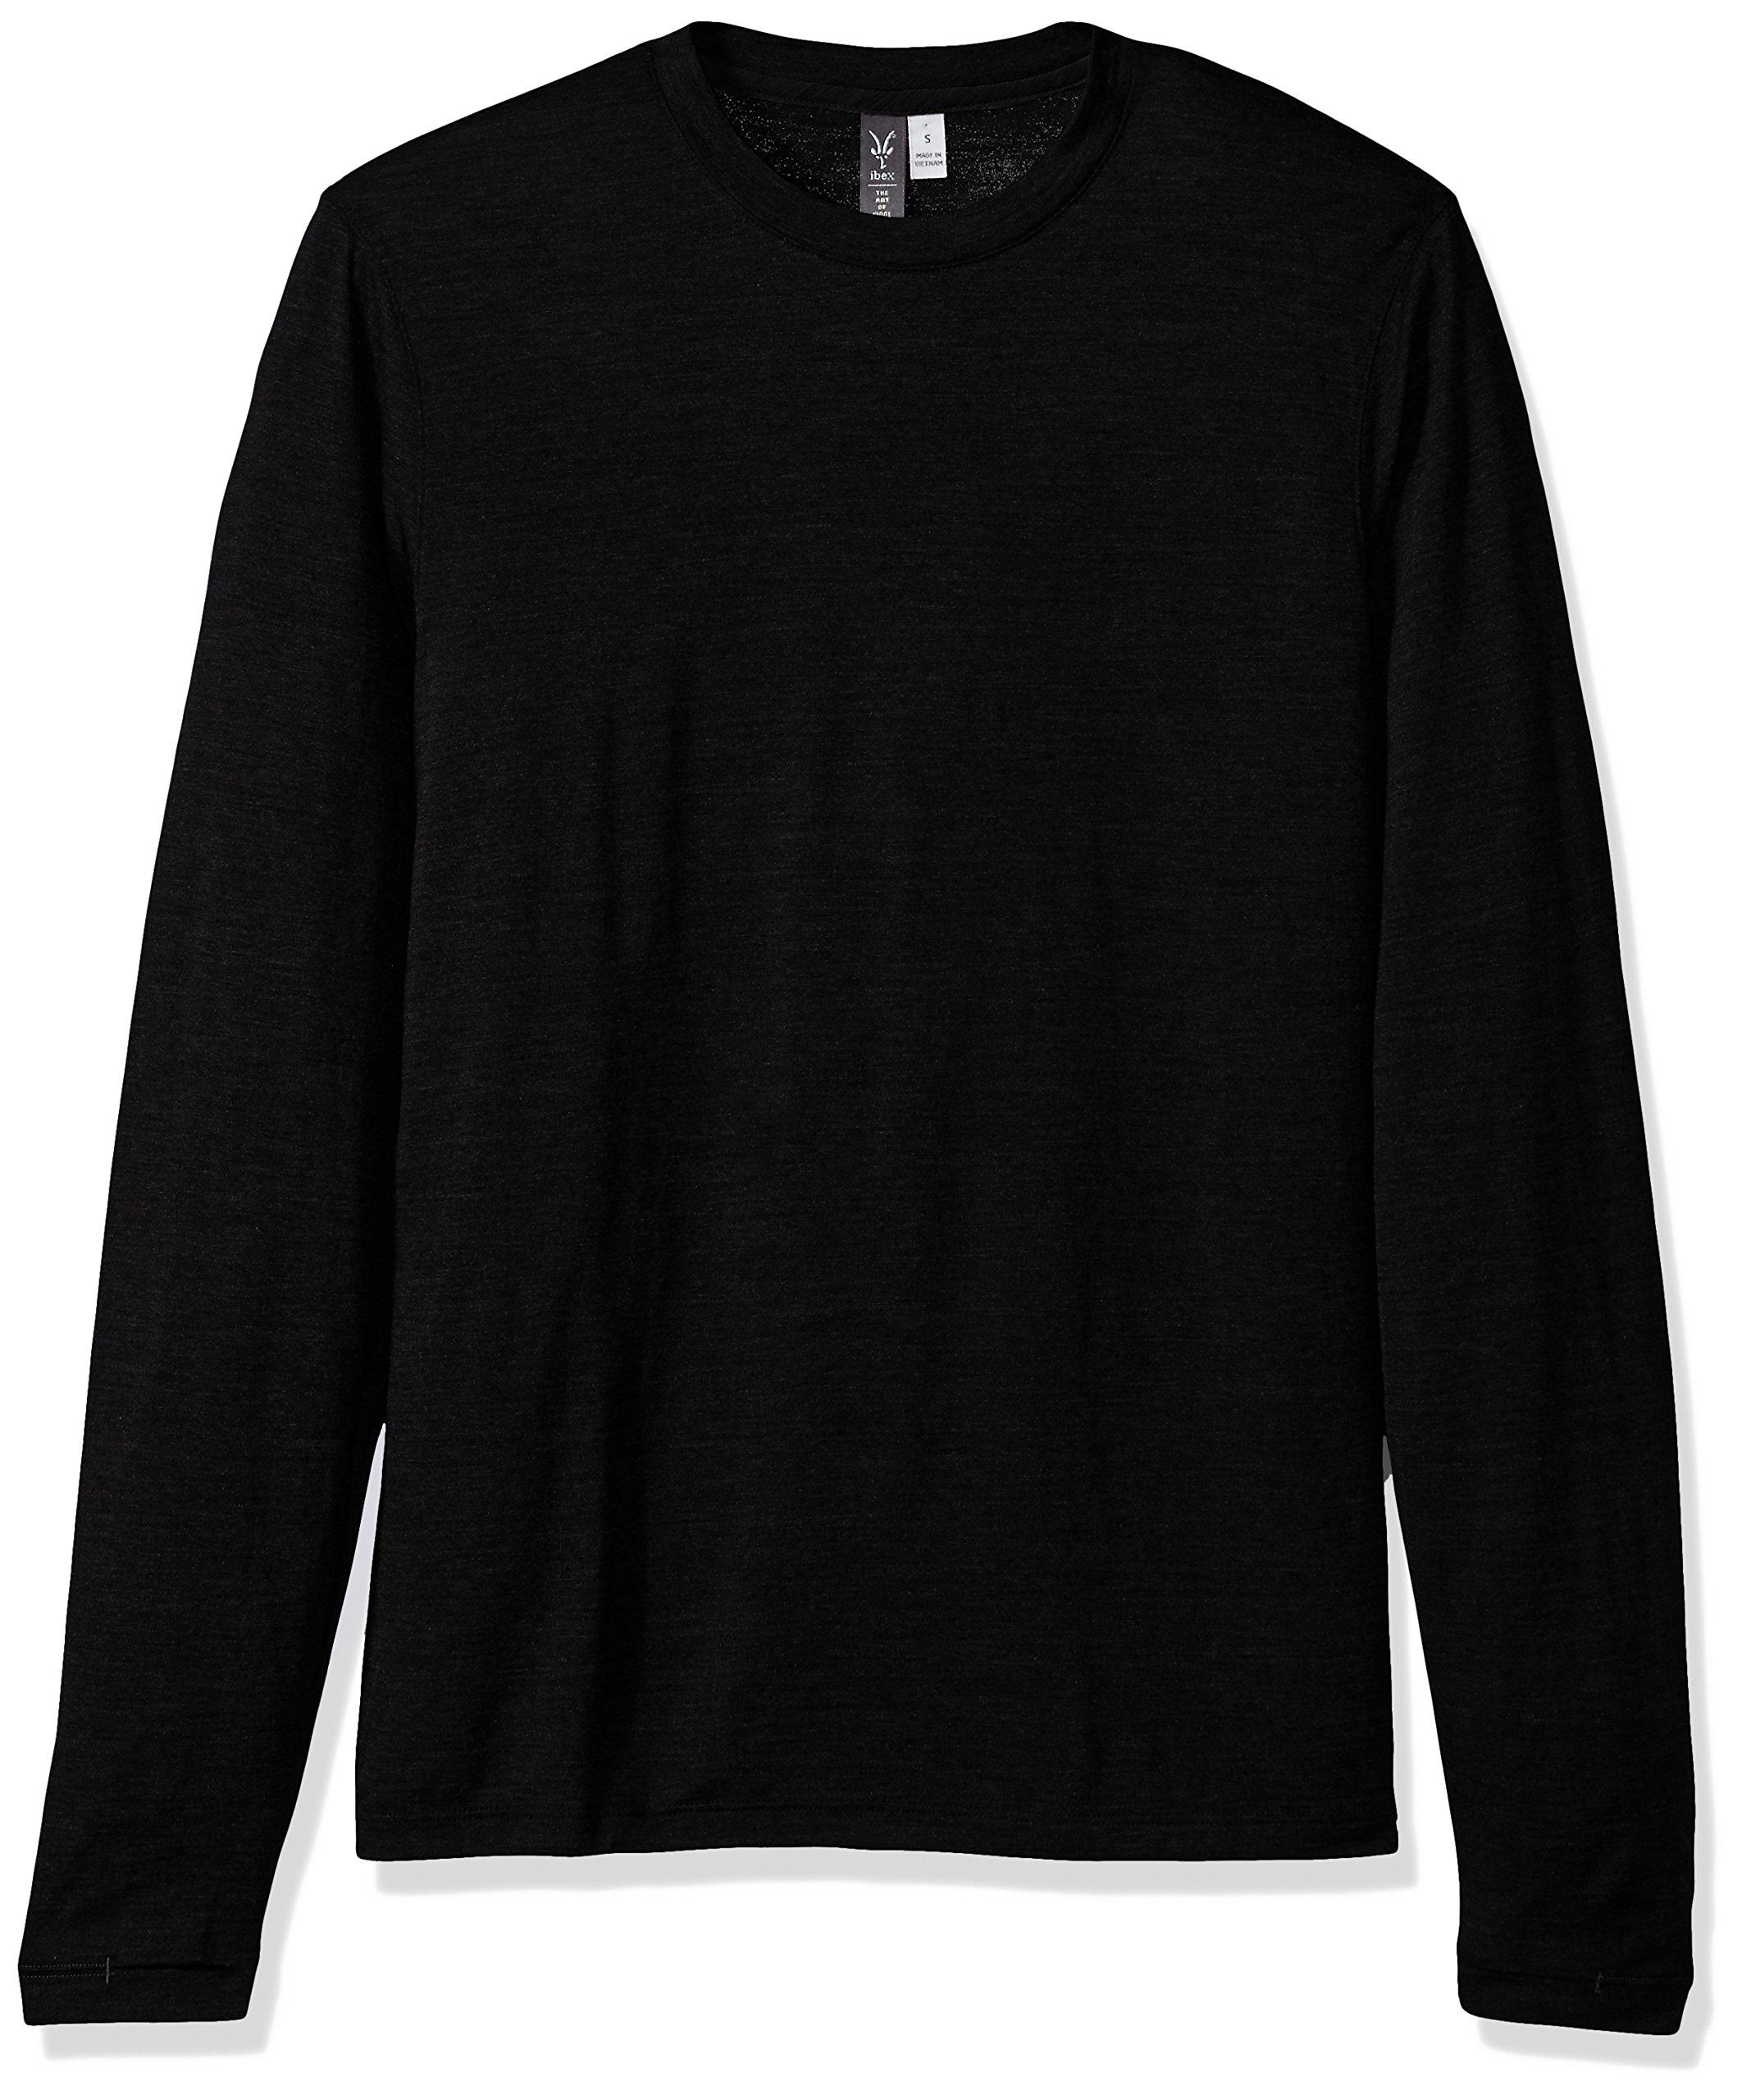 Ibex Outdoor Clothing Merino Wool Essential Crew T-Shirt, Black, Large